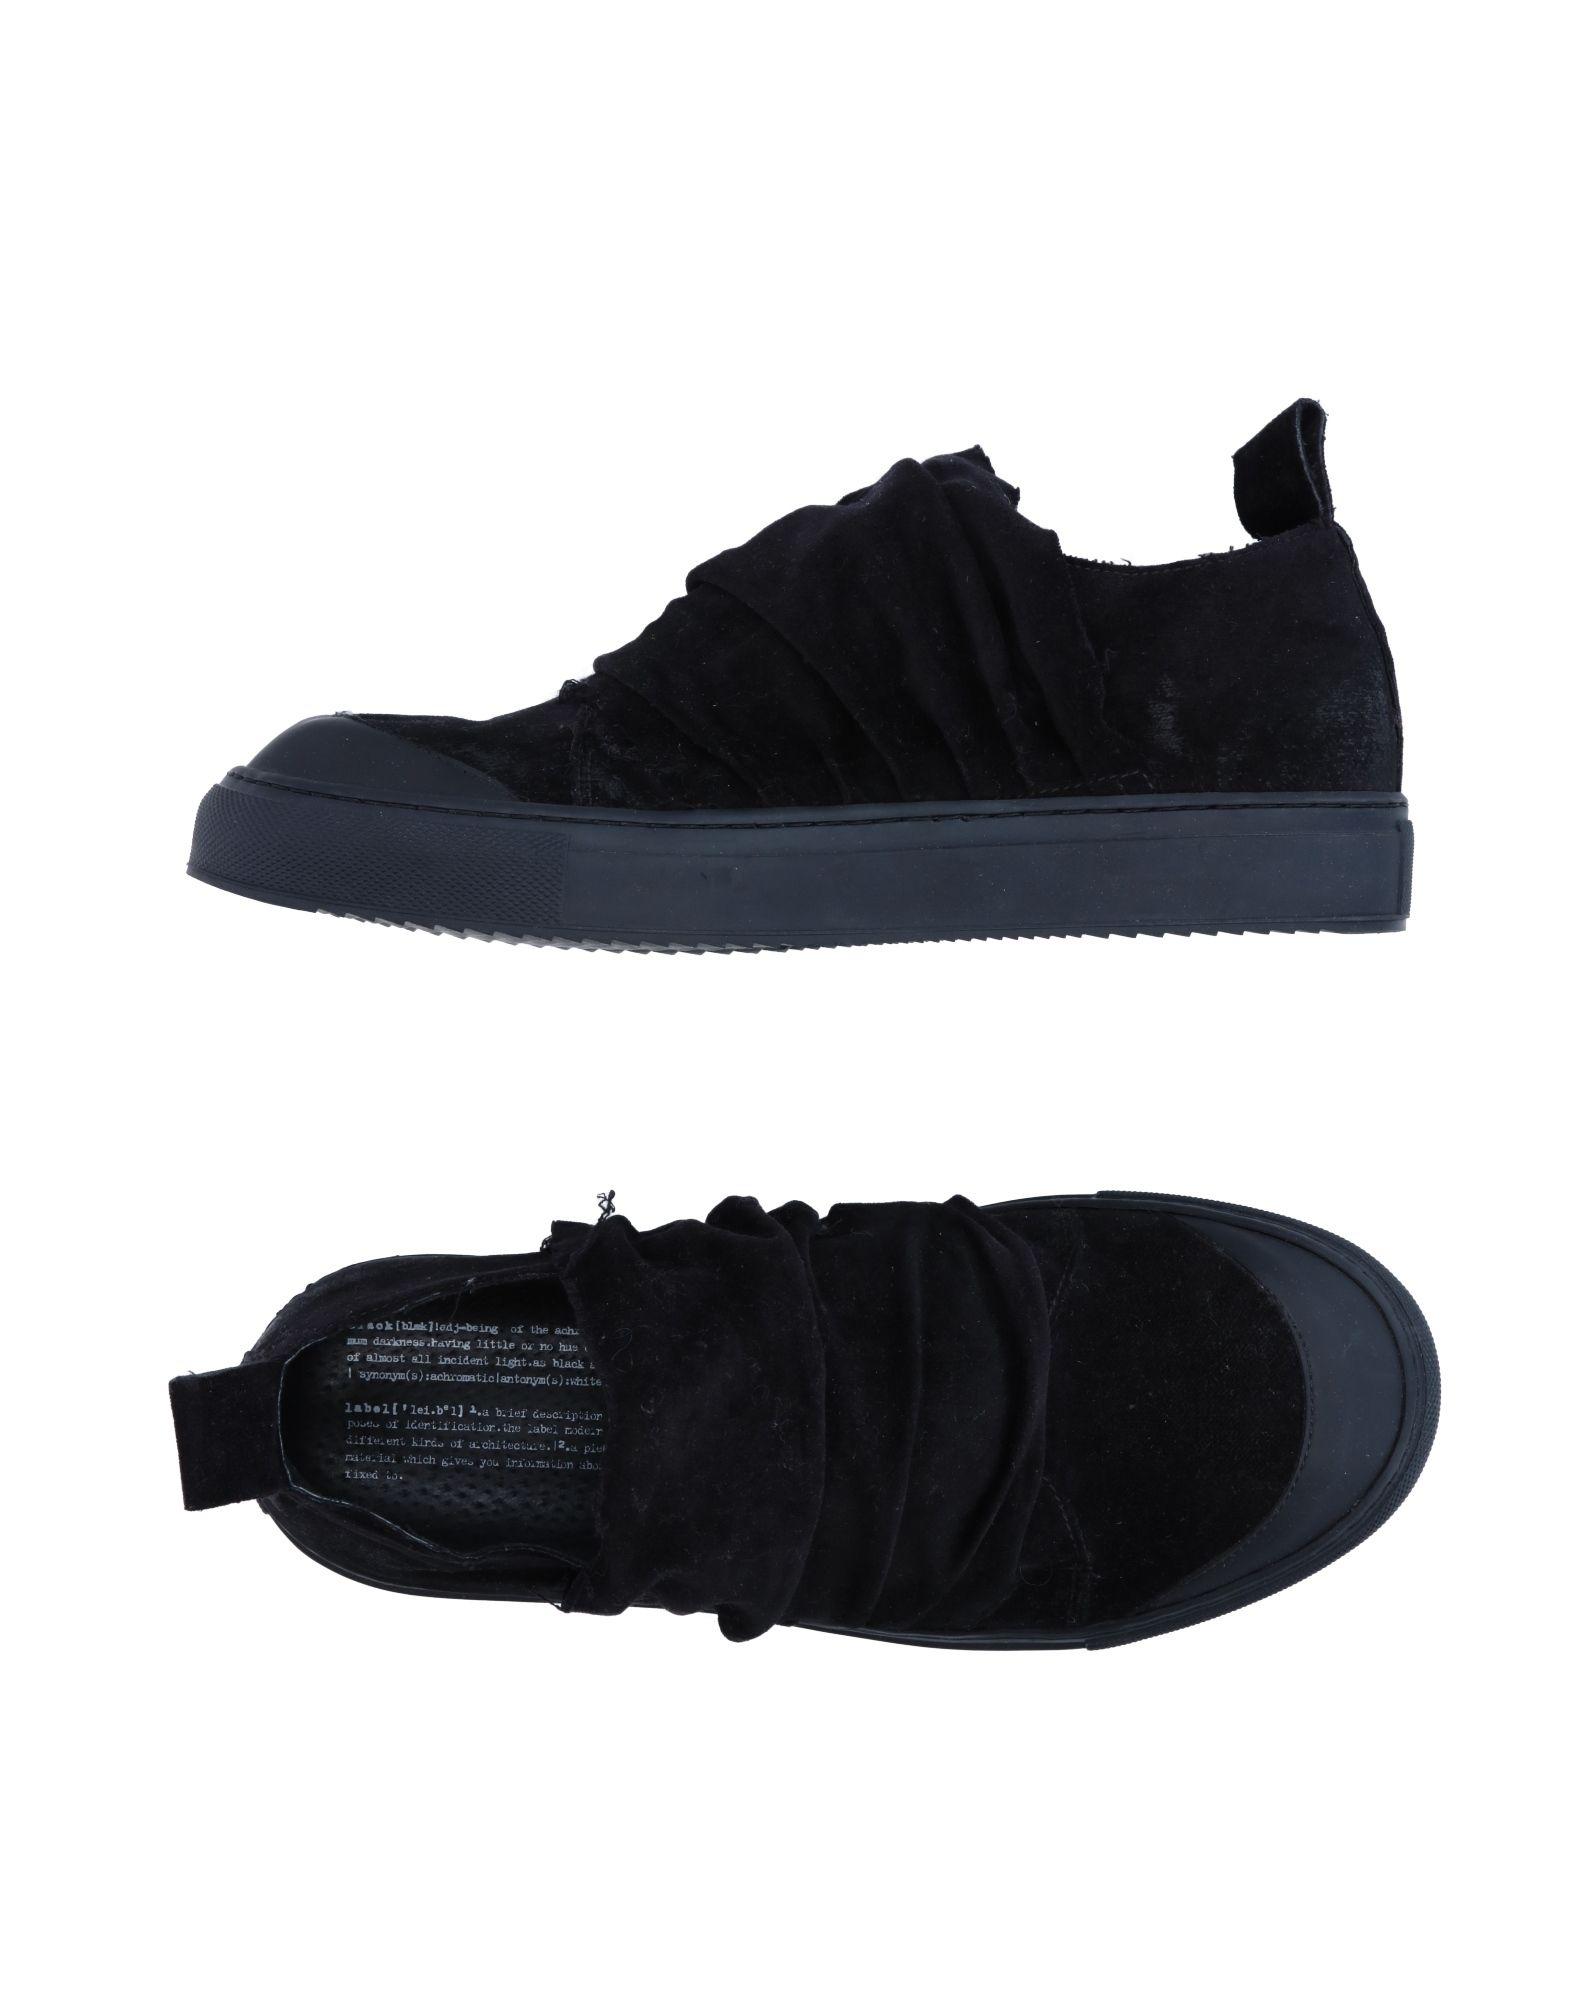 RUNDHOLZ BLACK LABEL Низкие кеды и кроссовки кеды кроссовки низкие детские quiksilver beacon black black grey